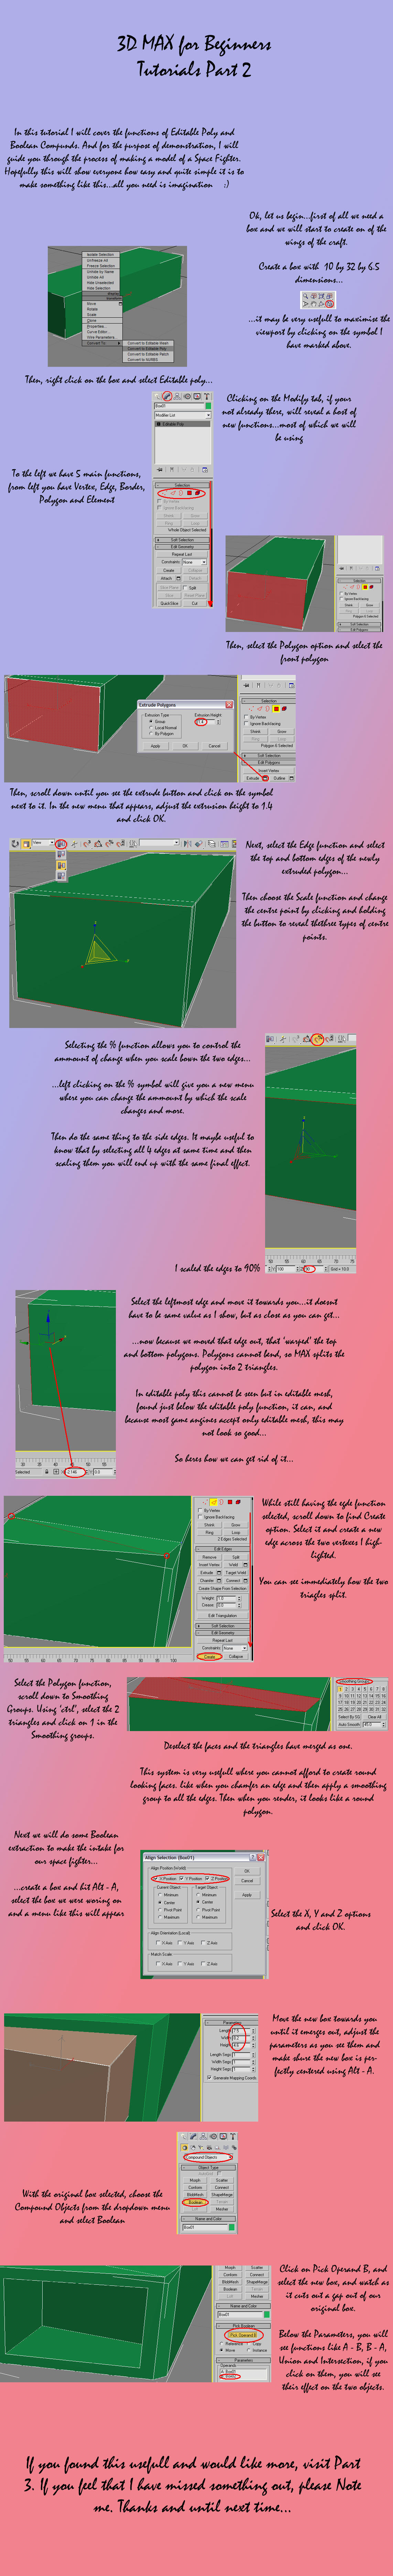 3d max tutorials part 2 by ulyses on deviantart for 3d max tutorial